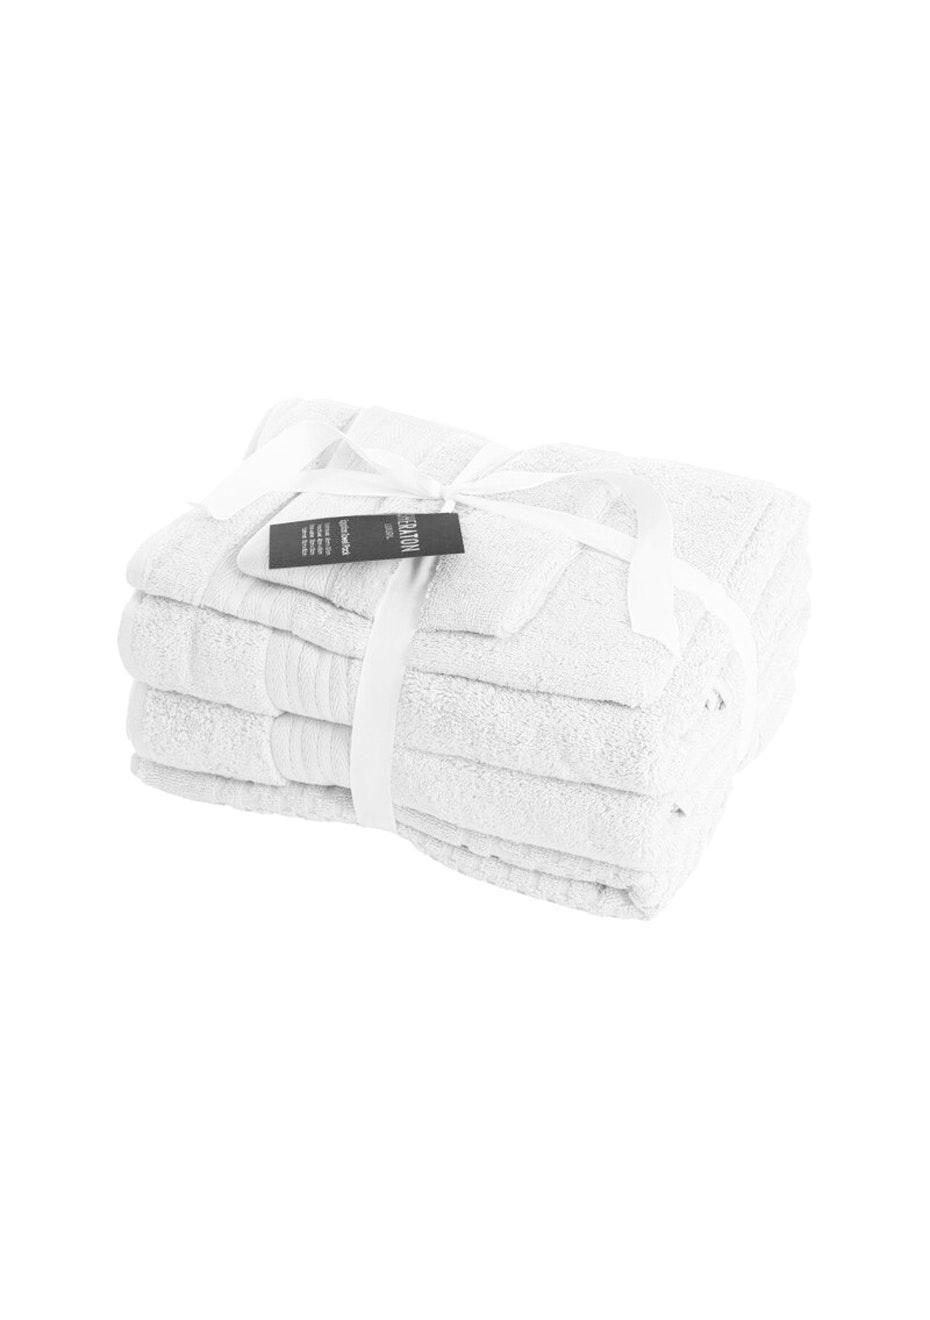 Sheraton Egptian 5 Piece Towel Pack - Colour White